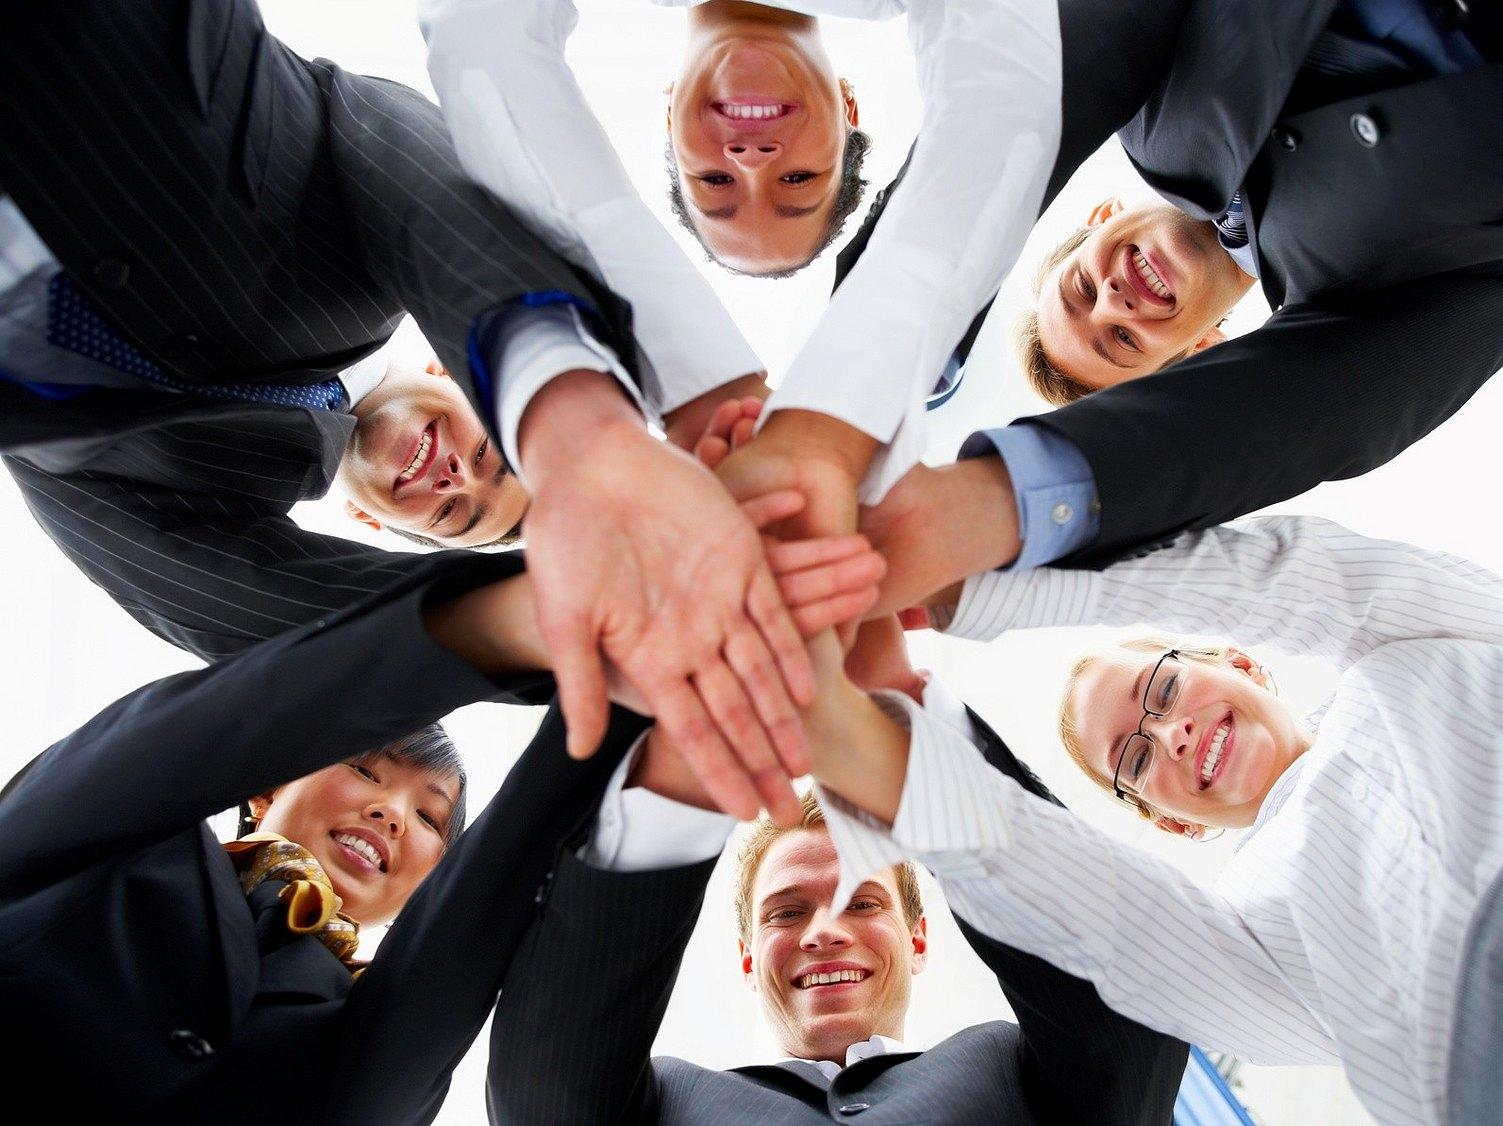 Teamwork and team spirit